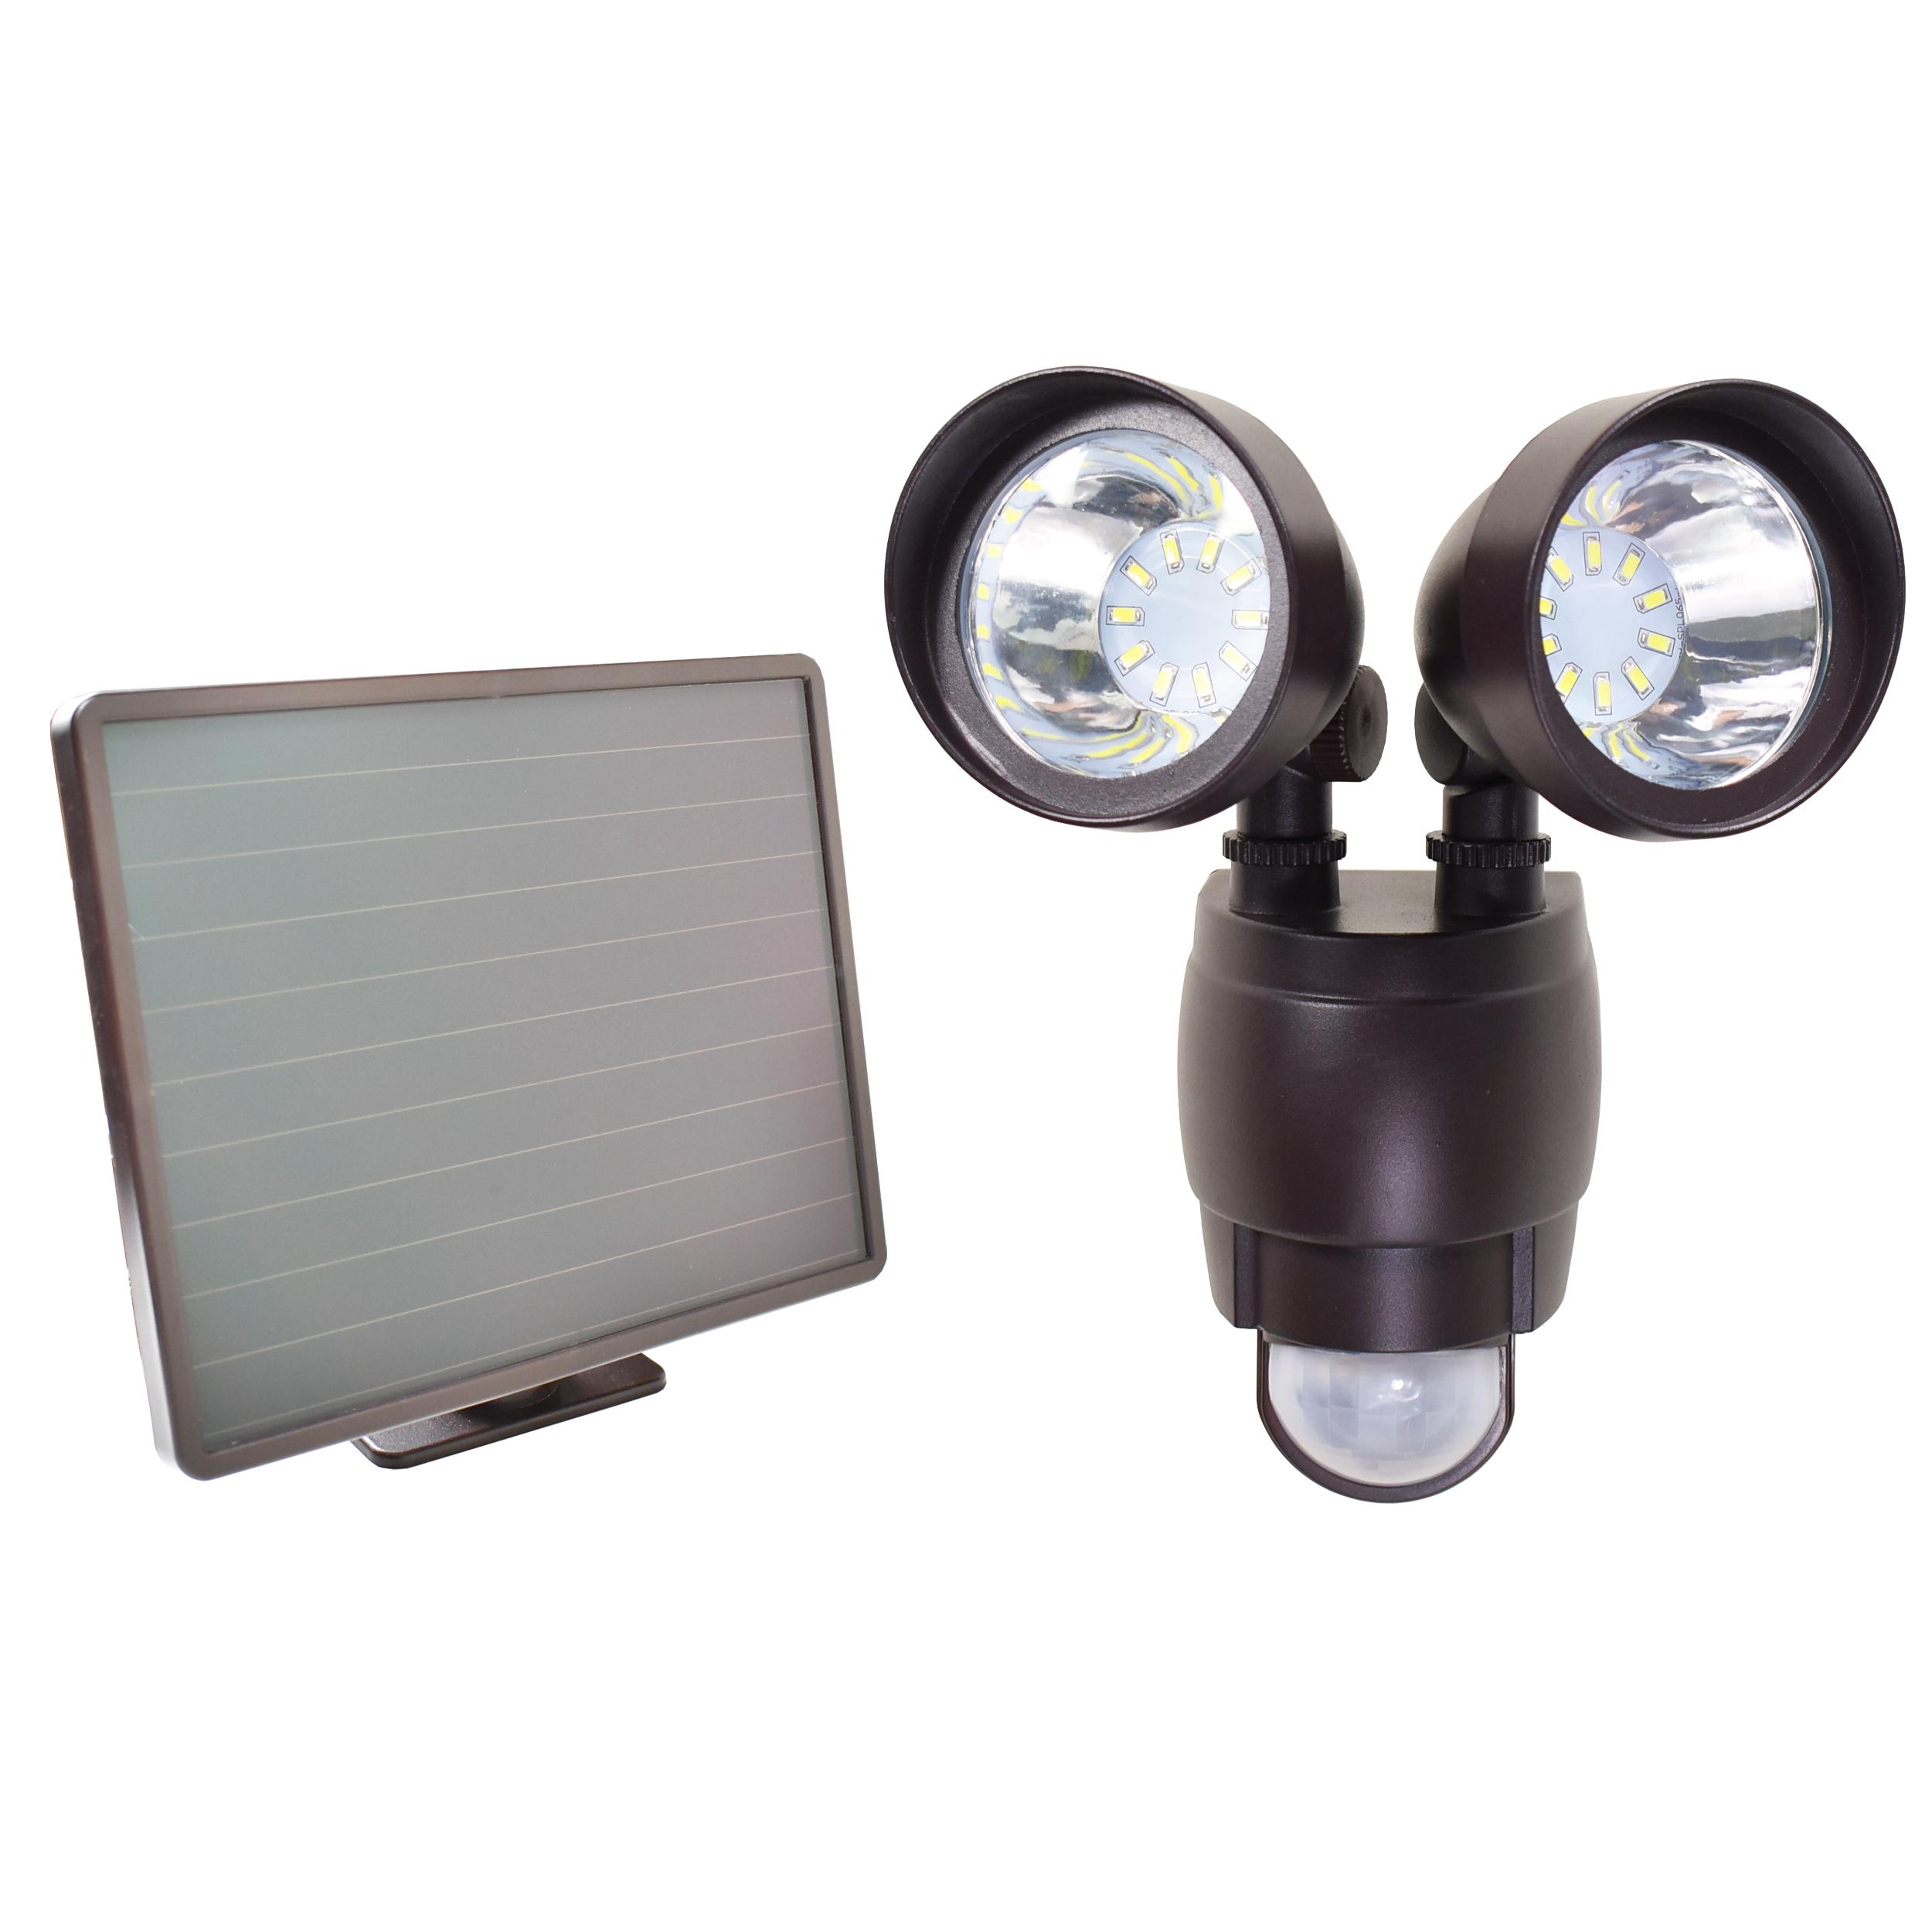 20 Smd Led Dual Security Detector Solar Spot Light Motion Sensor